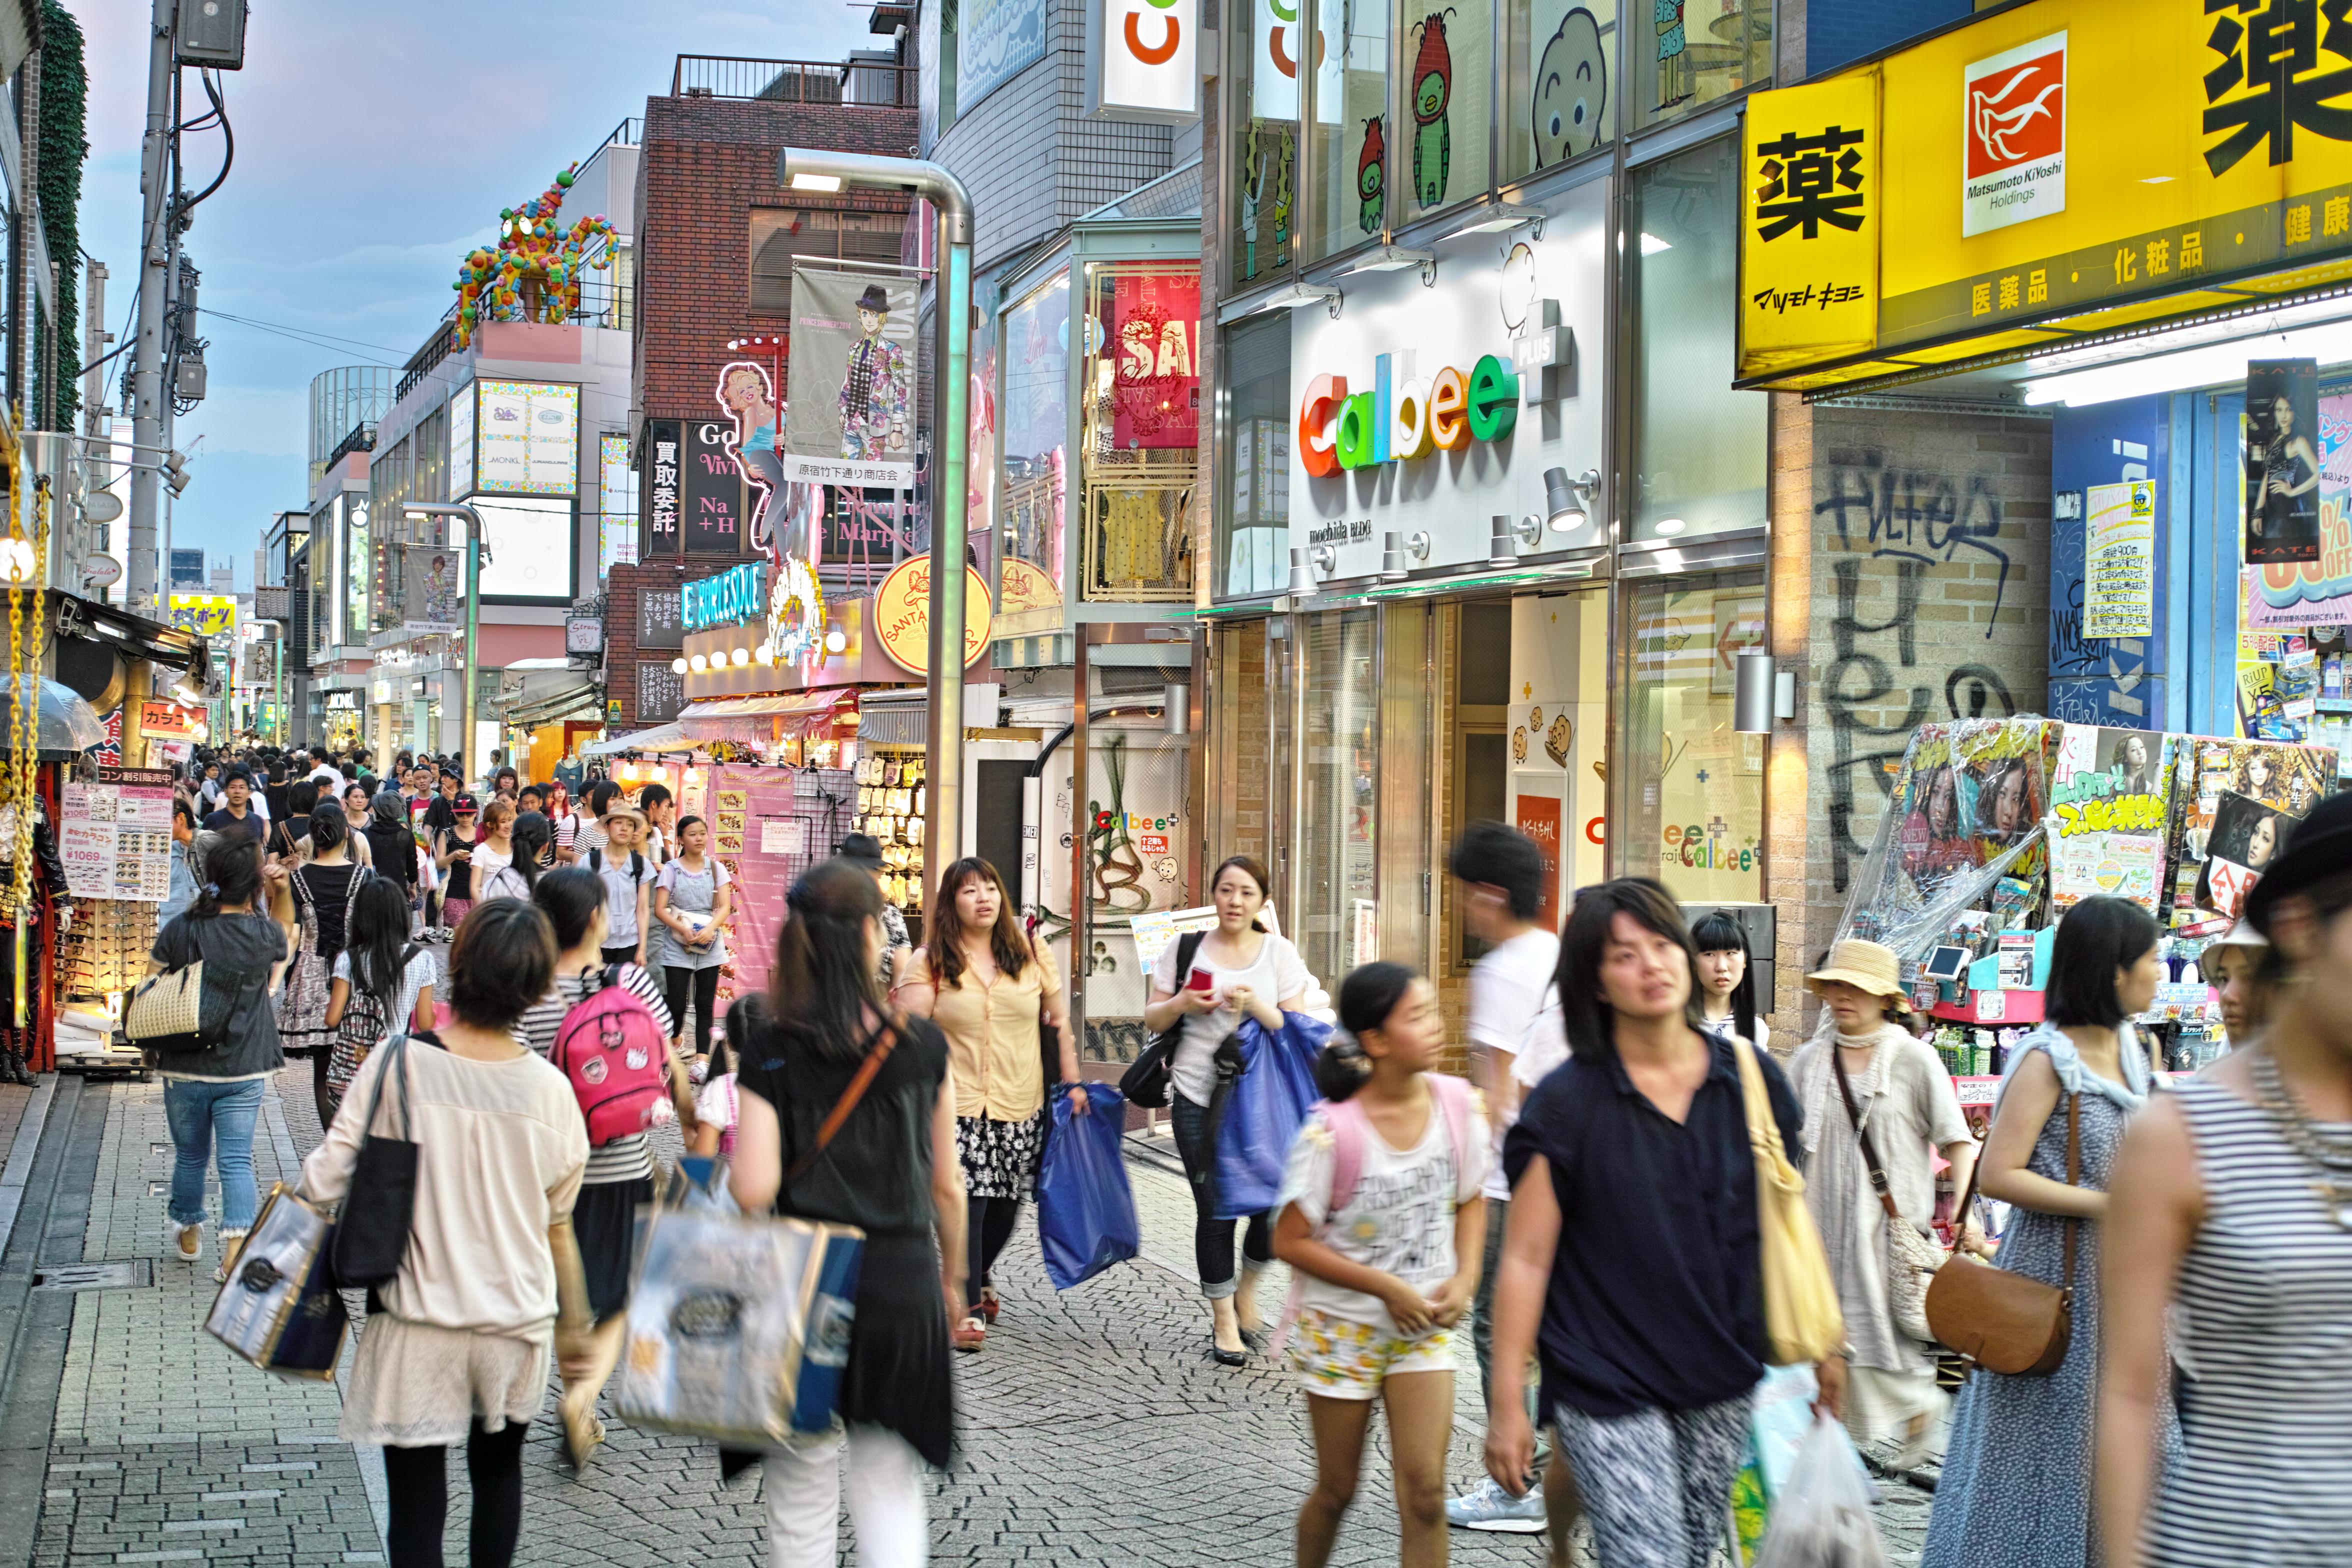 Takeshita ulica u Tokiju poznata po šopingu (foto: Shutterstock)